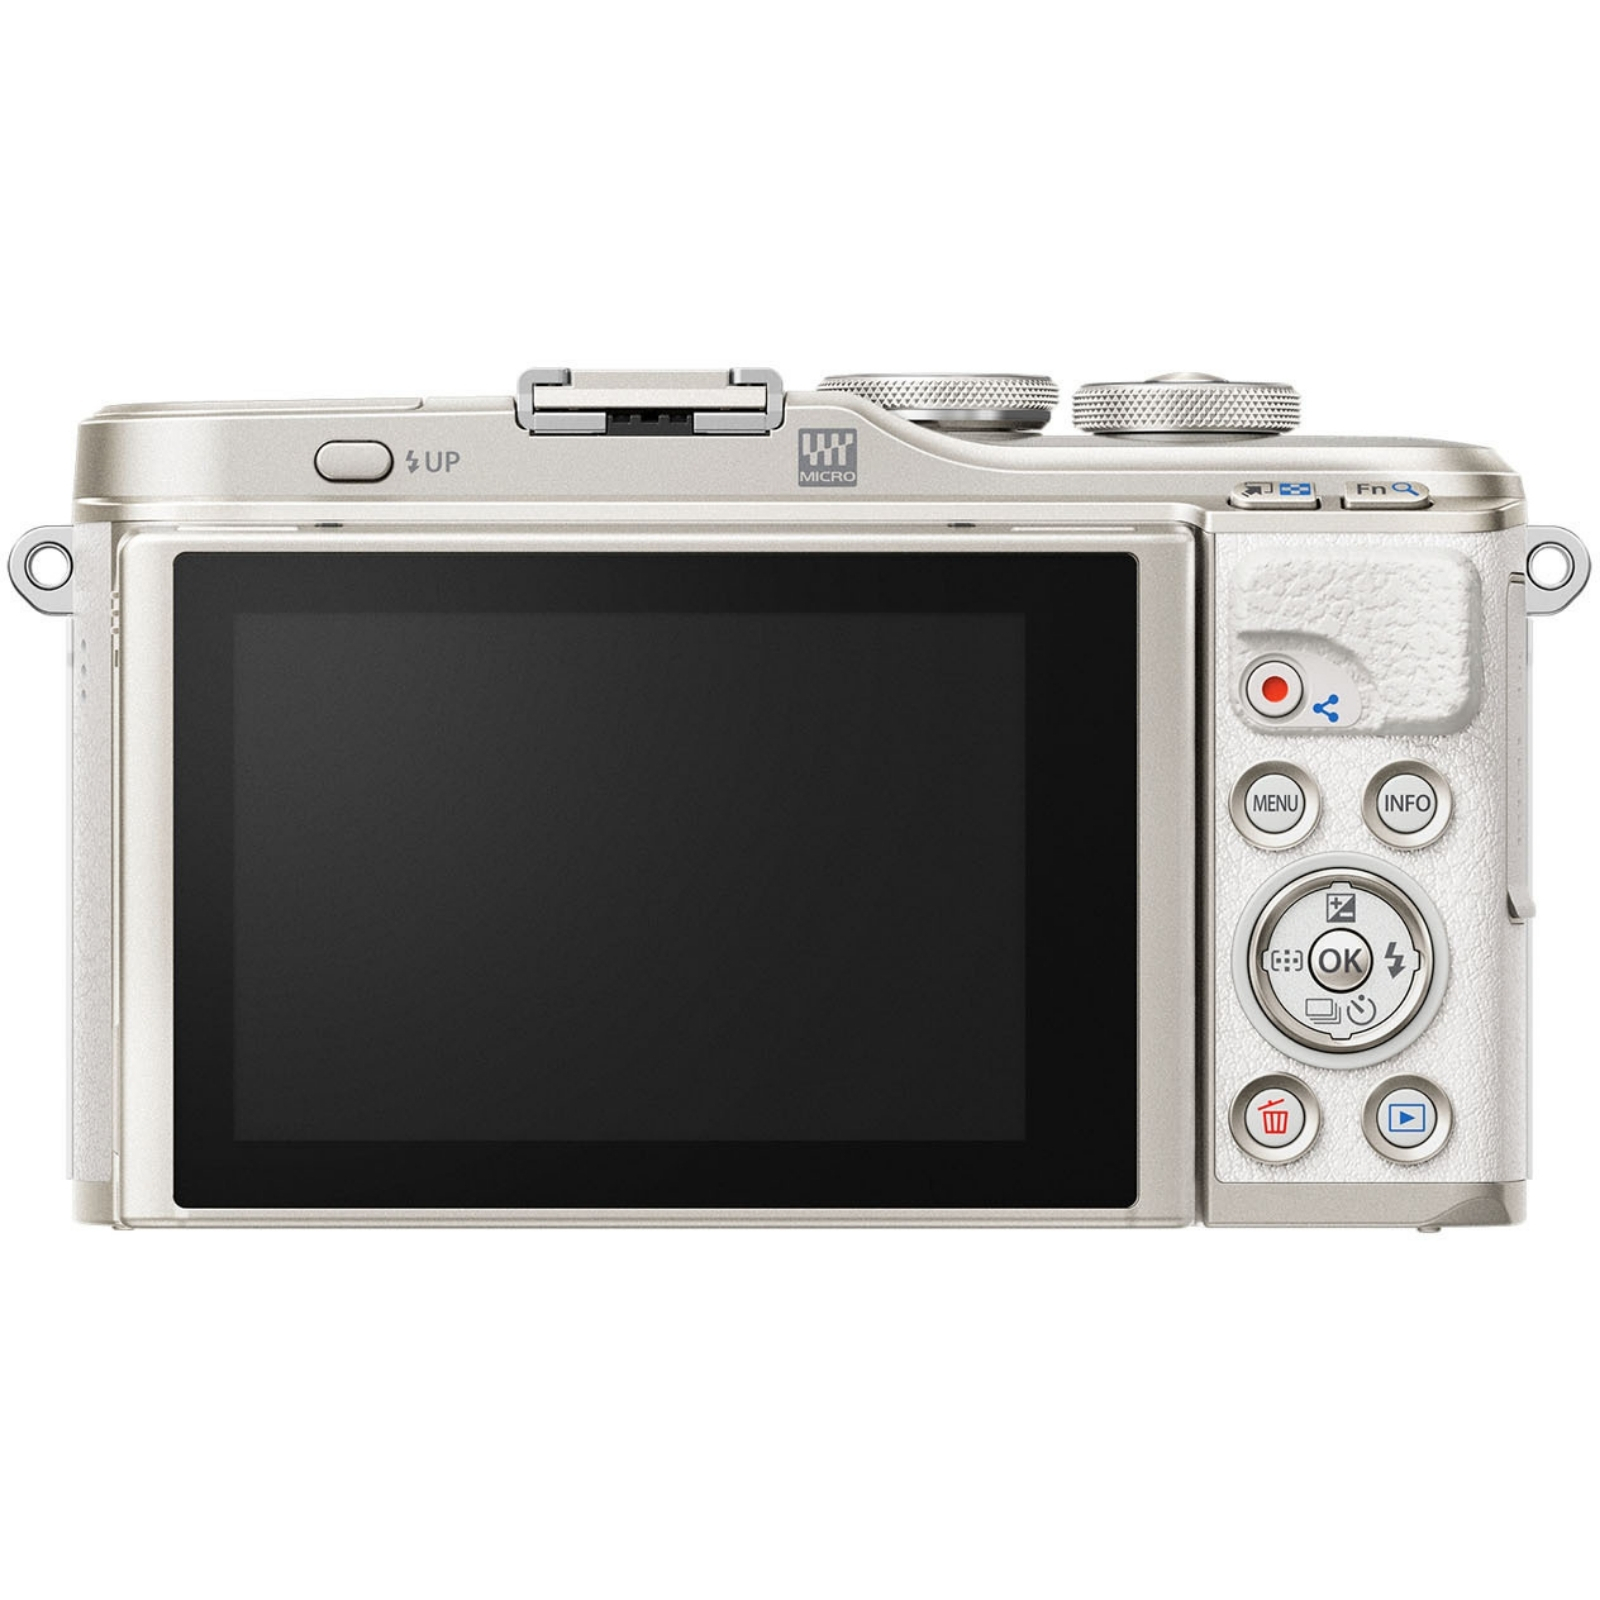 OLYMPUS オリンパス ミラーレス一眼カメラ PEN E-PL10 ボディー ホワイト 新品